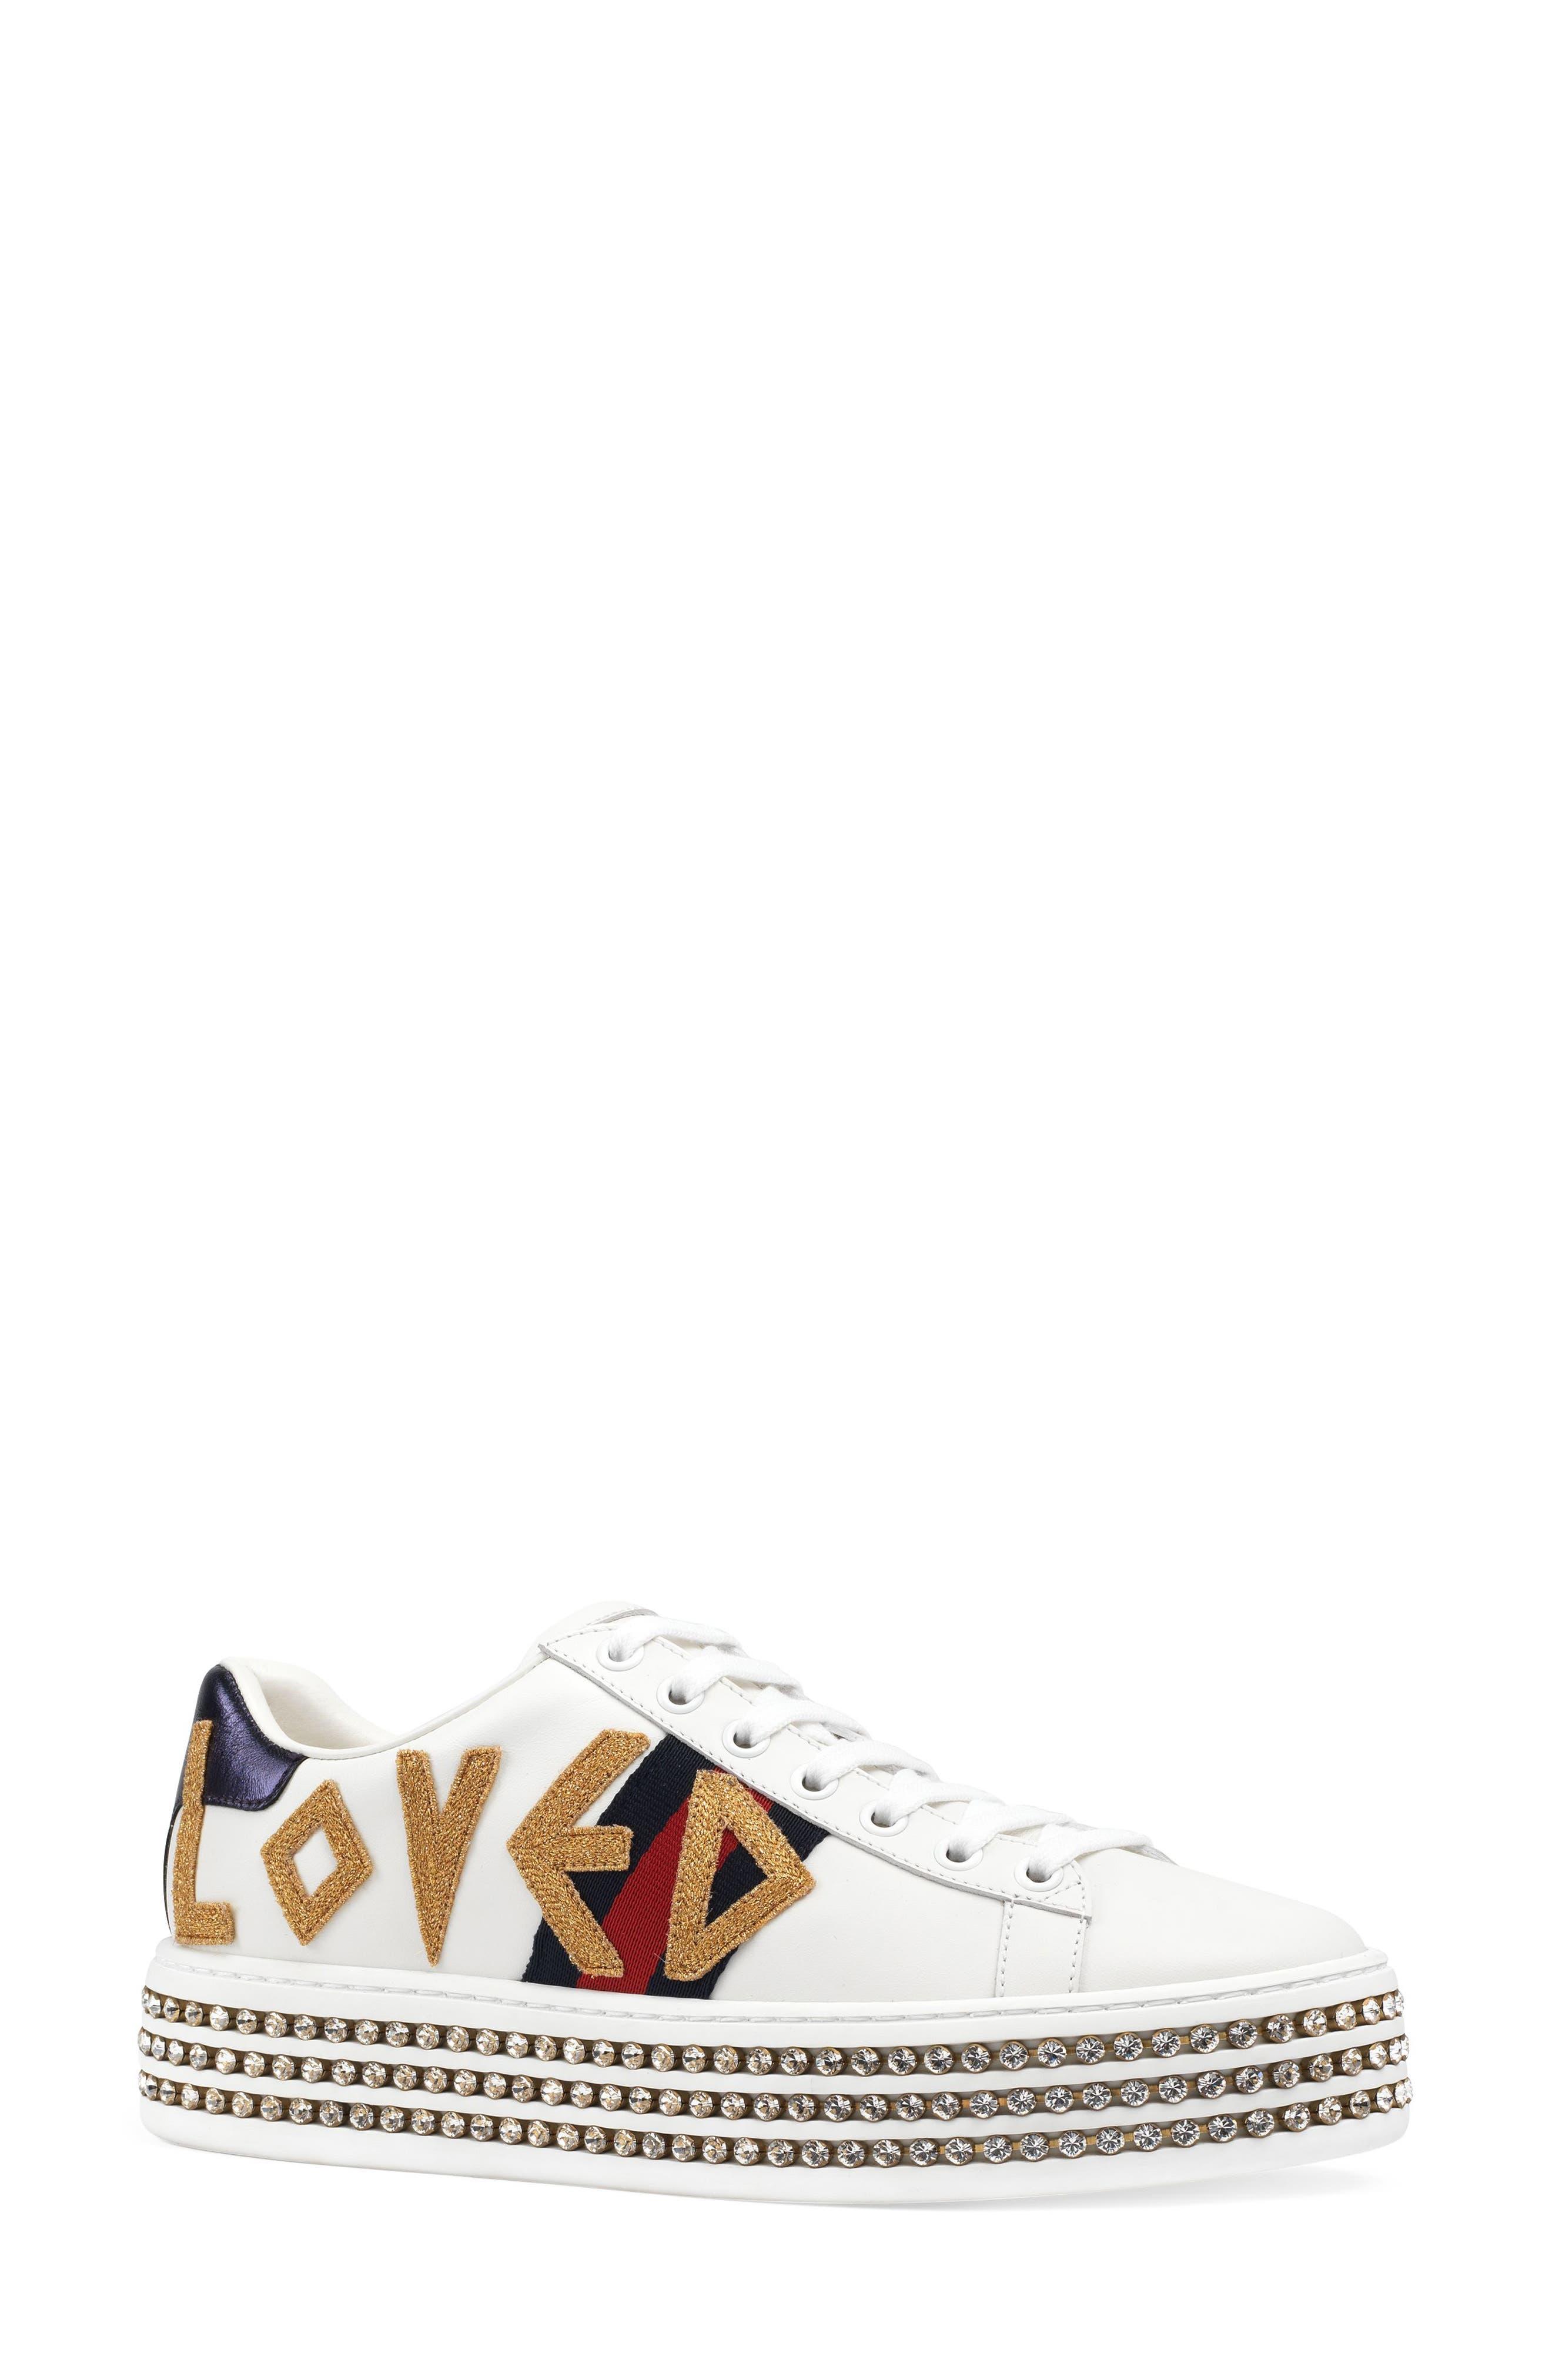 Main Image - Gucci New Ace Crystal Embellished Flatform Sneaker (Women)